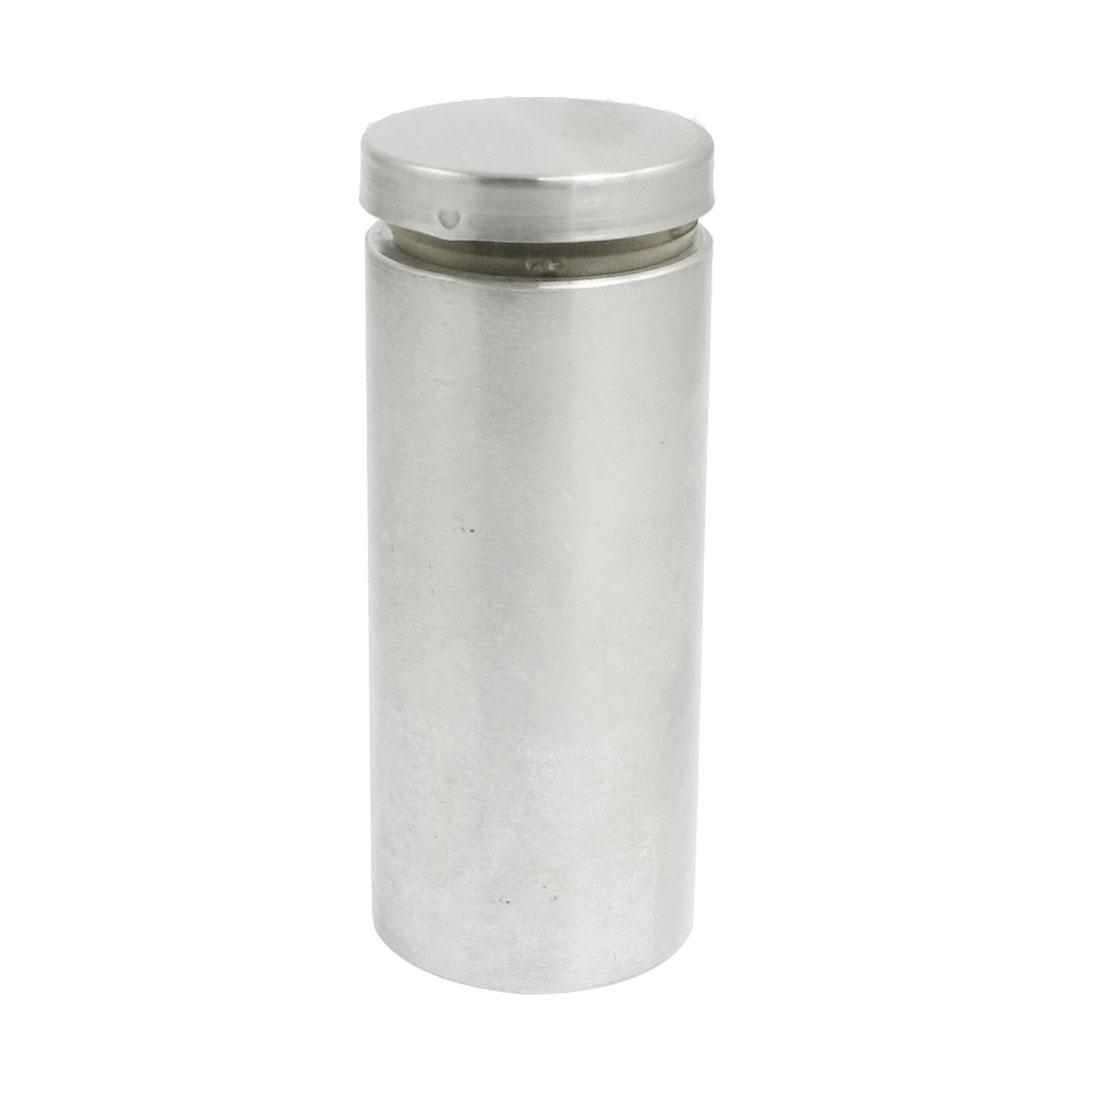 60mm Length 25mm Diameter Stainless Steel Advertising Nail